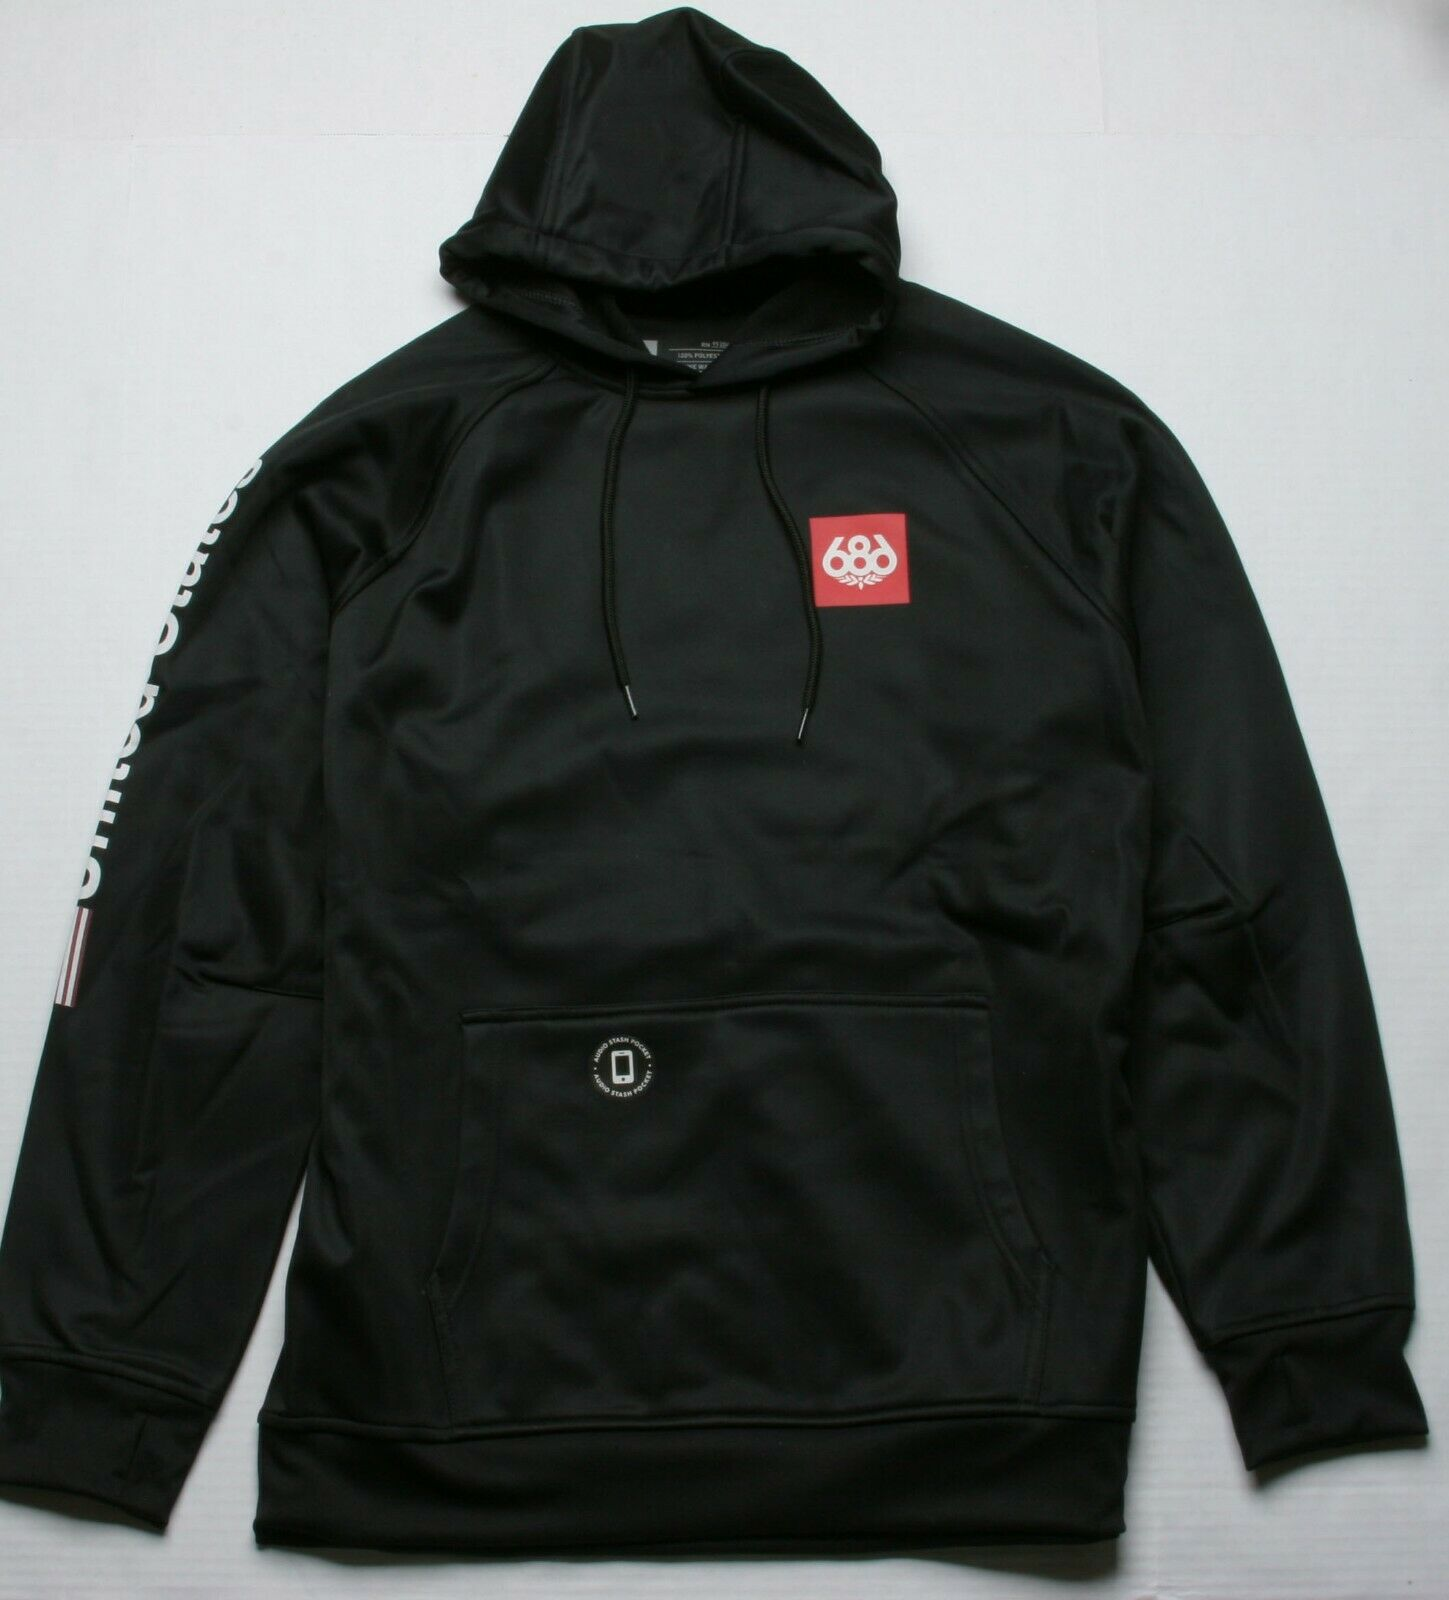 686 Home Anorak Fleece (L) Black M0WLAY02-BLK